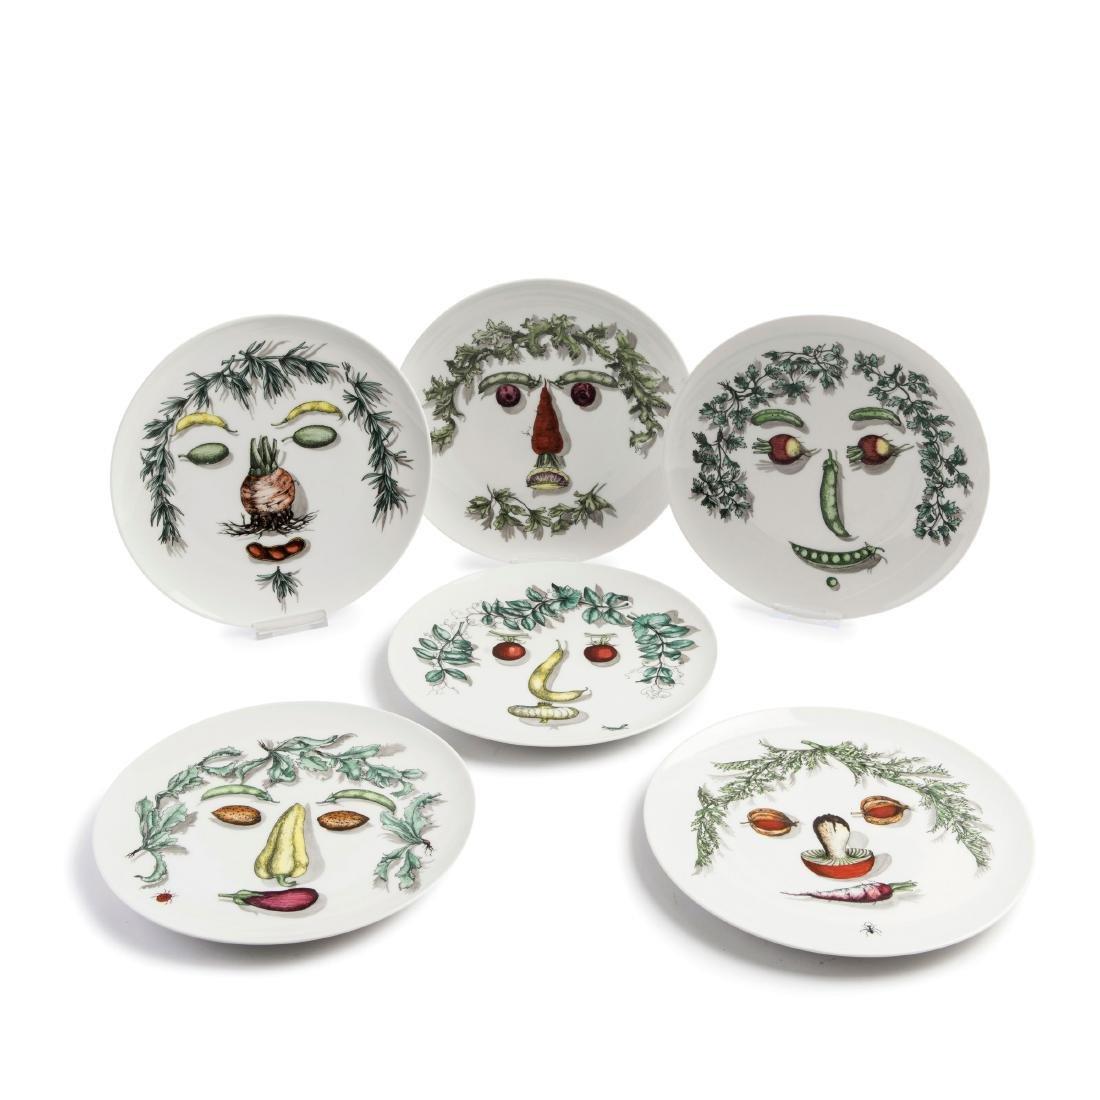 Six 'Arcimboldesca' plates, 1950/60s